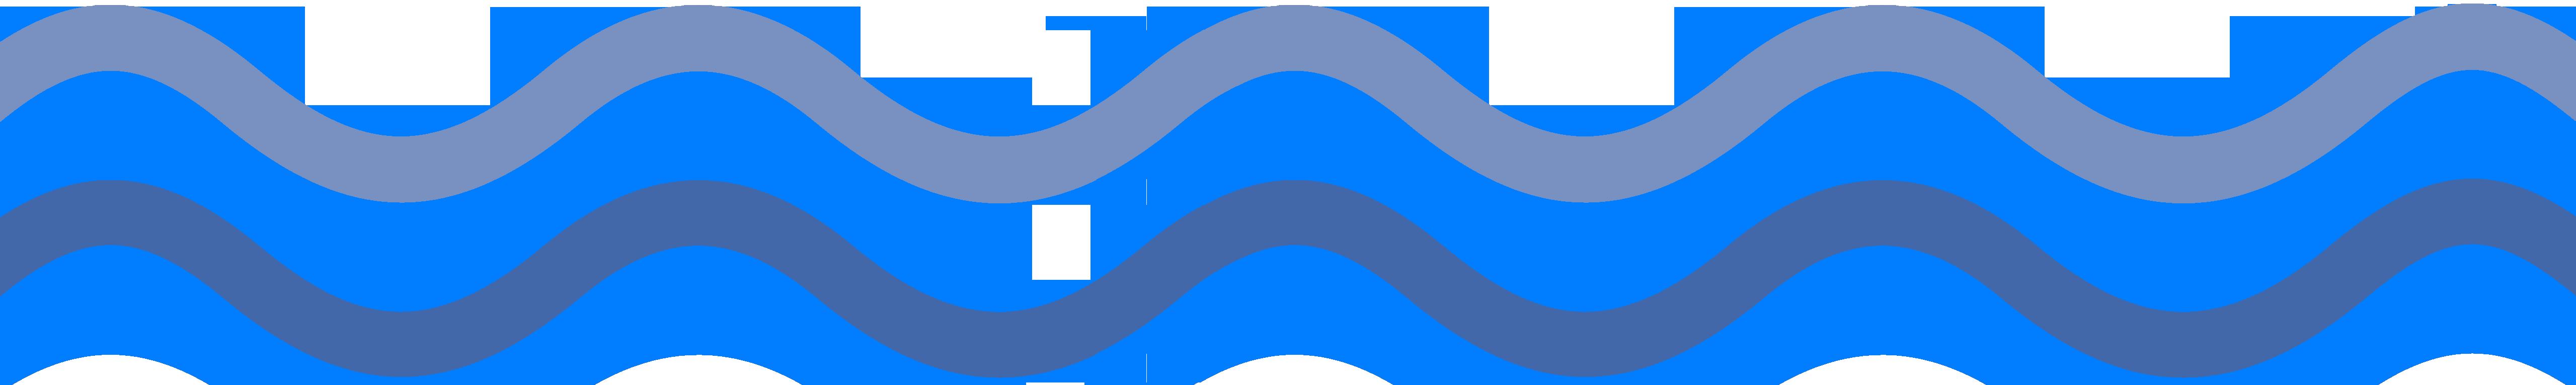 Wave top light, bottom dark blue